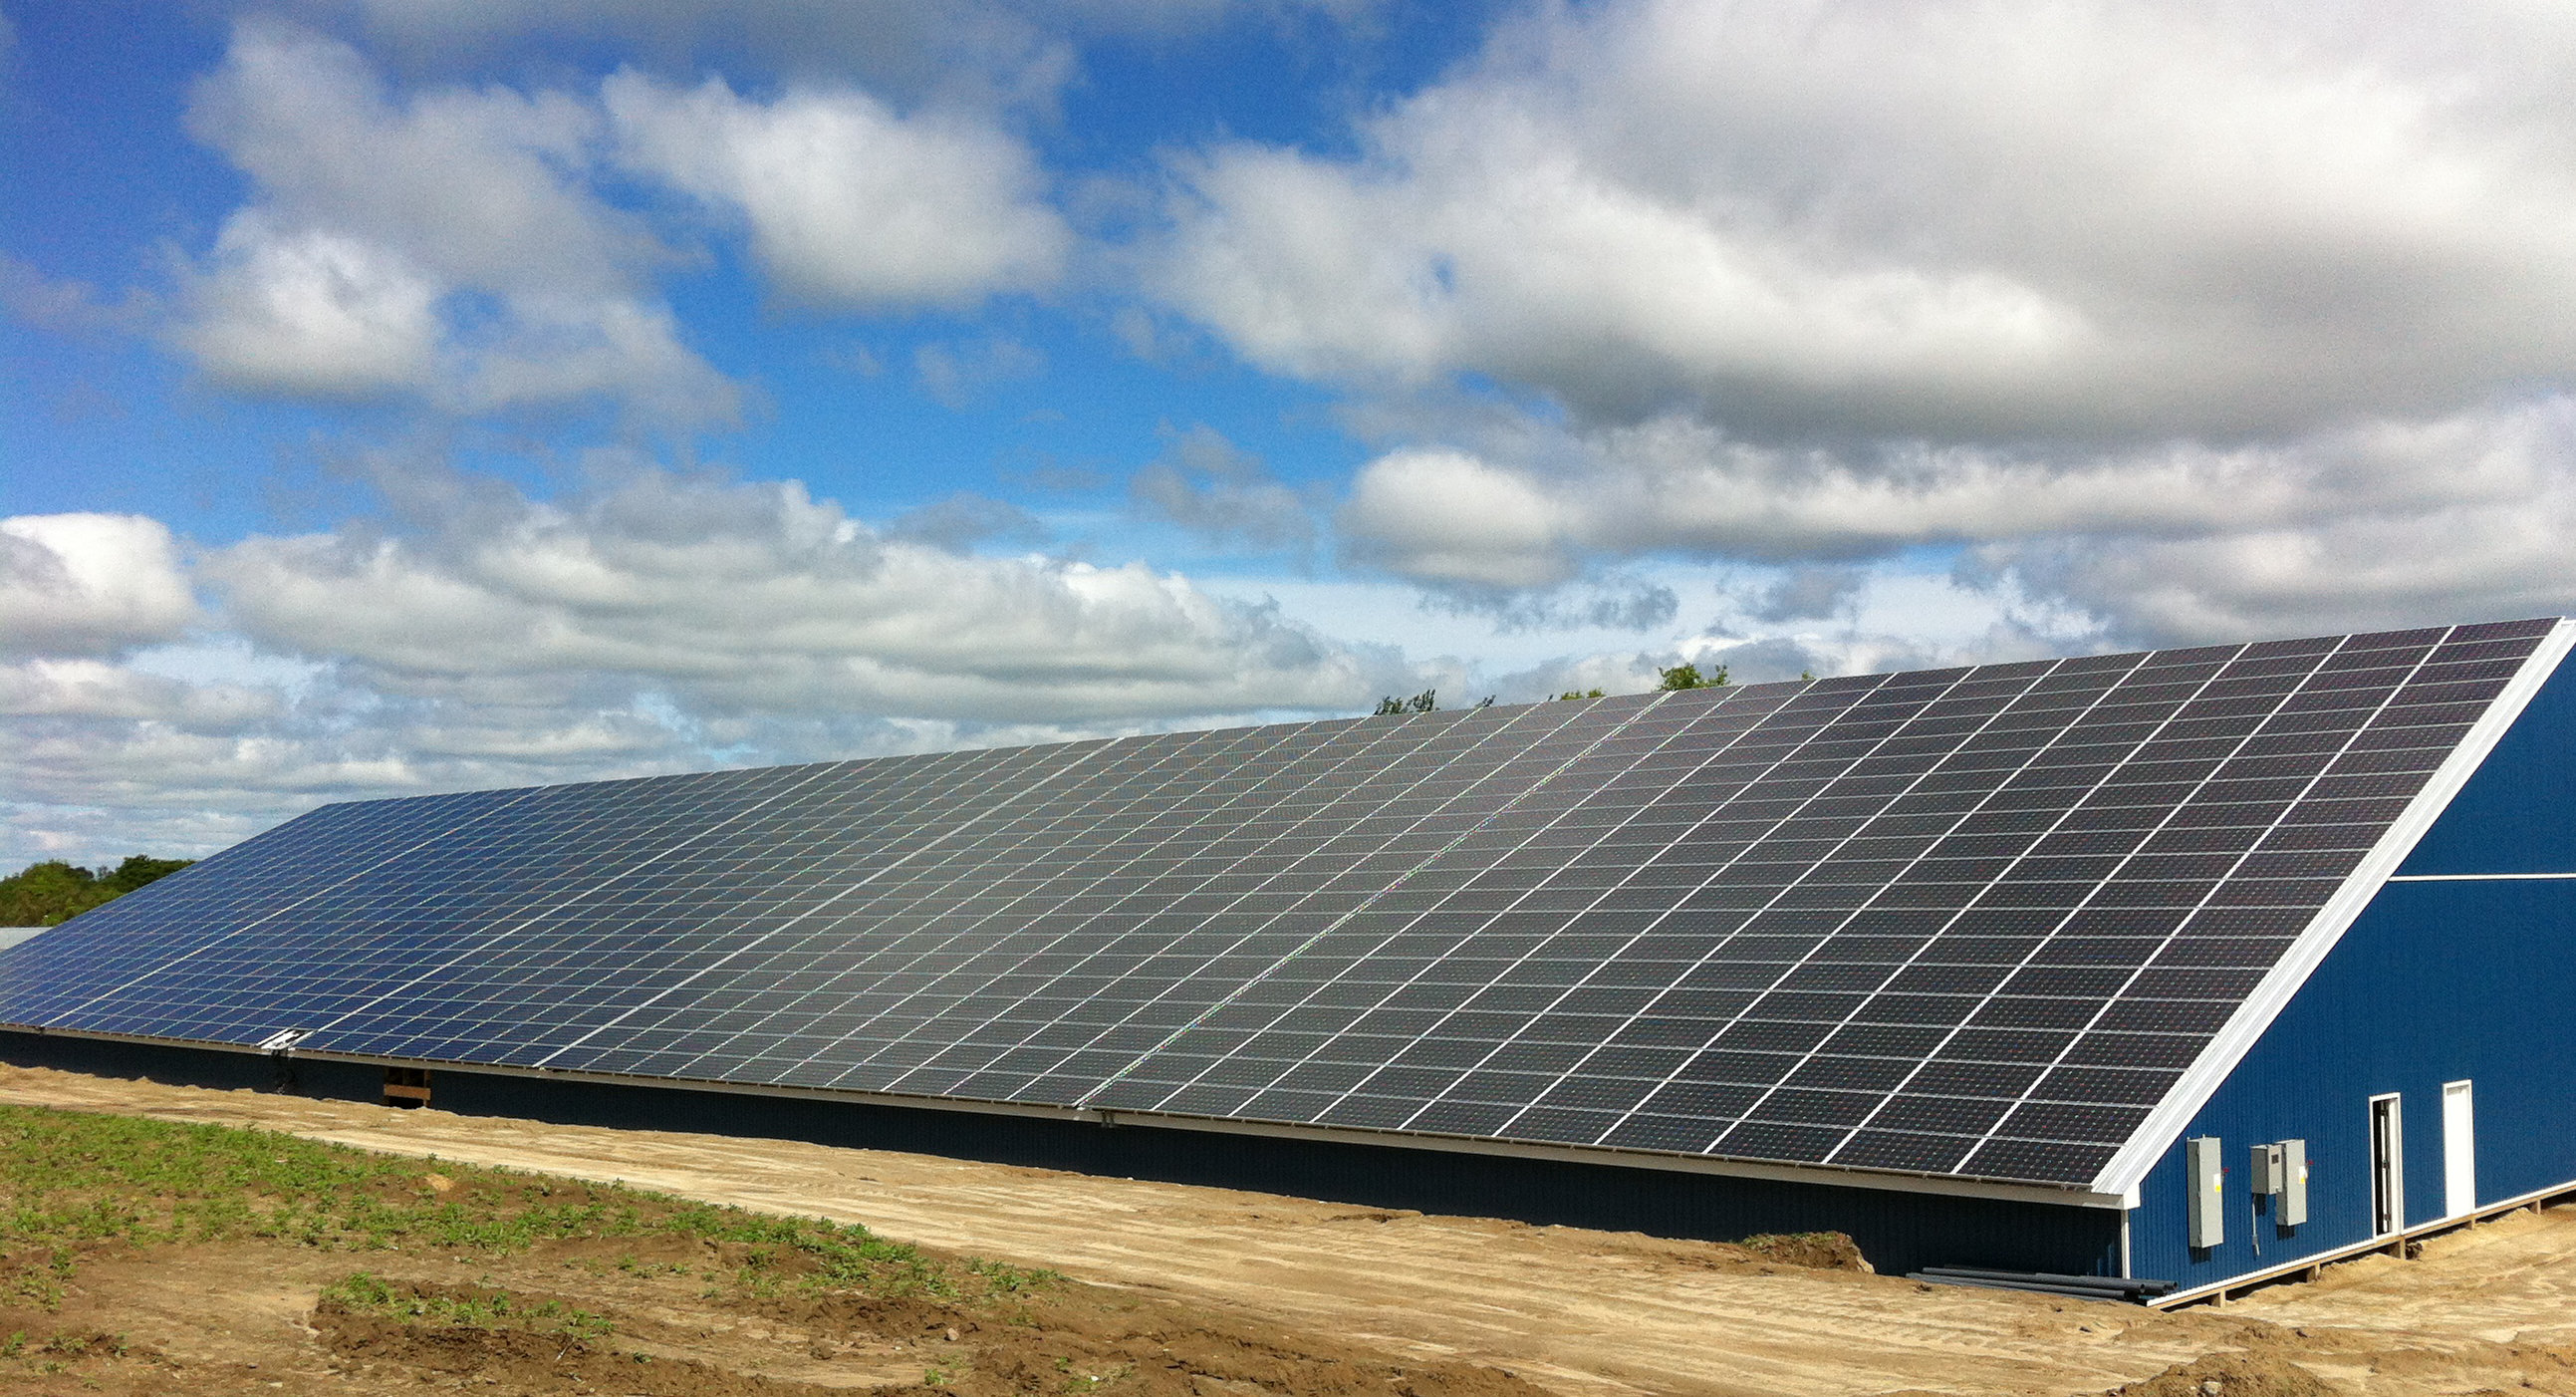 250 kW solar energy system